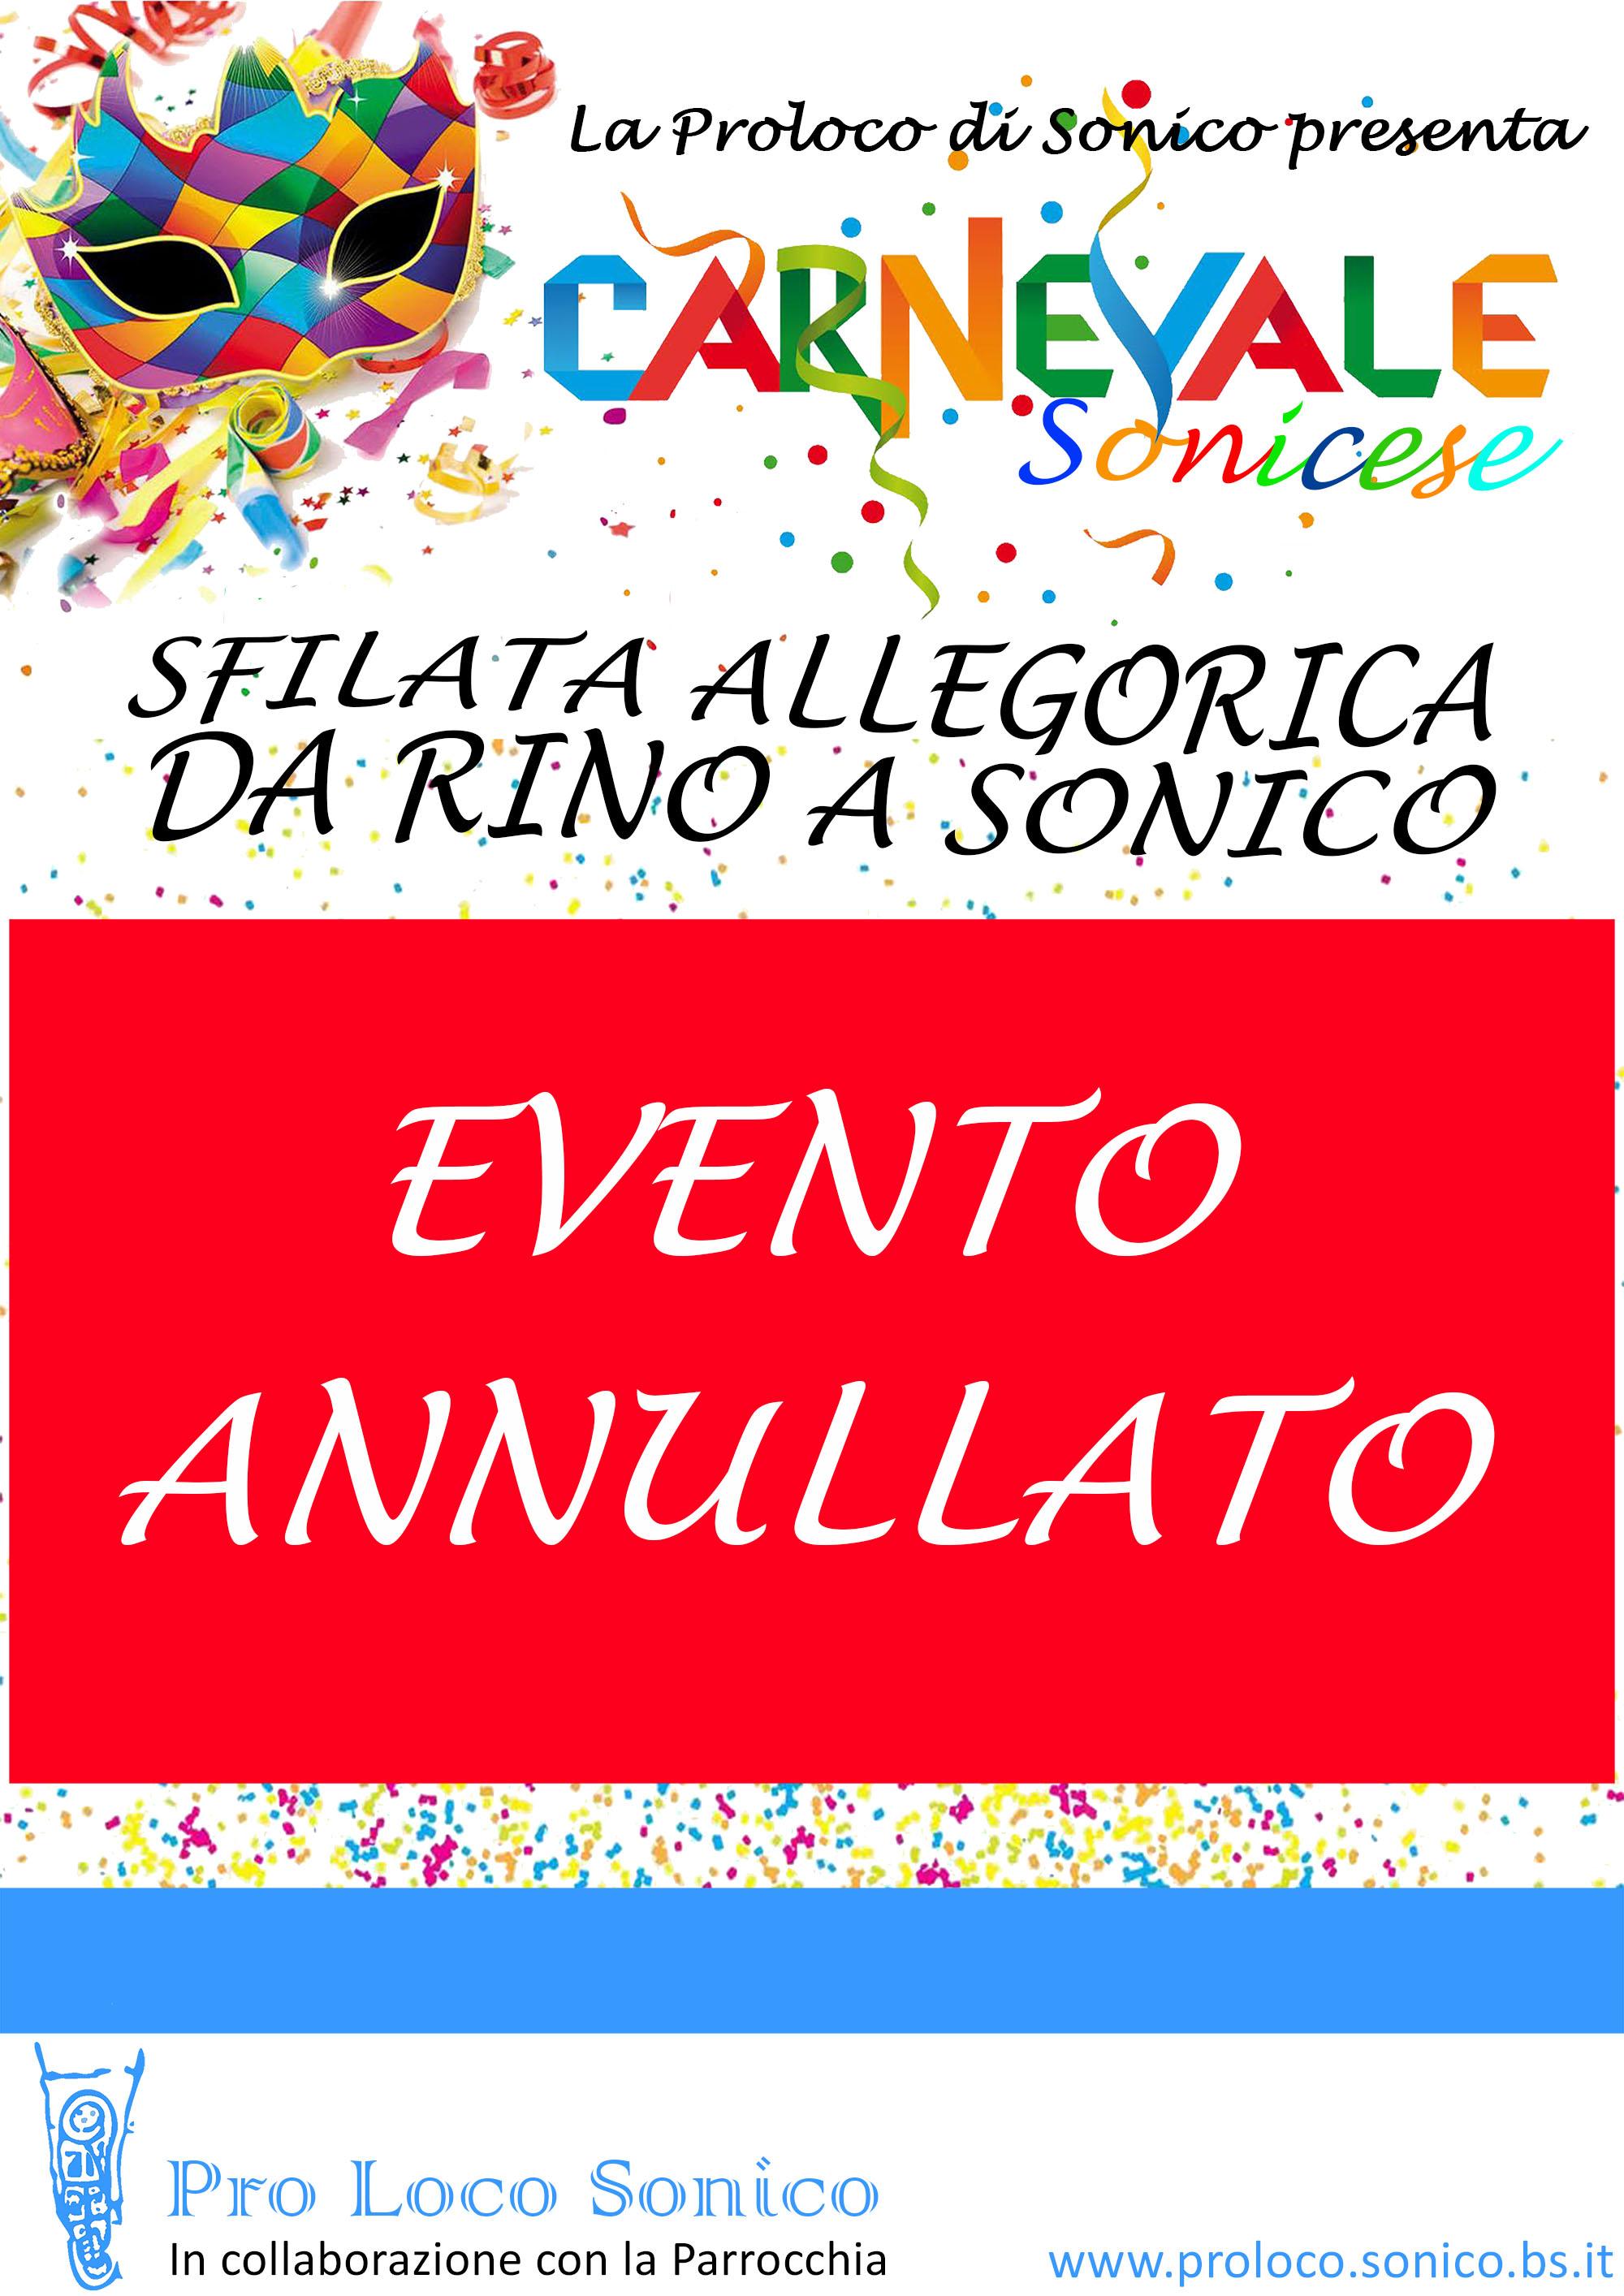 Carnevale 2020 – ANNULLATO!